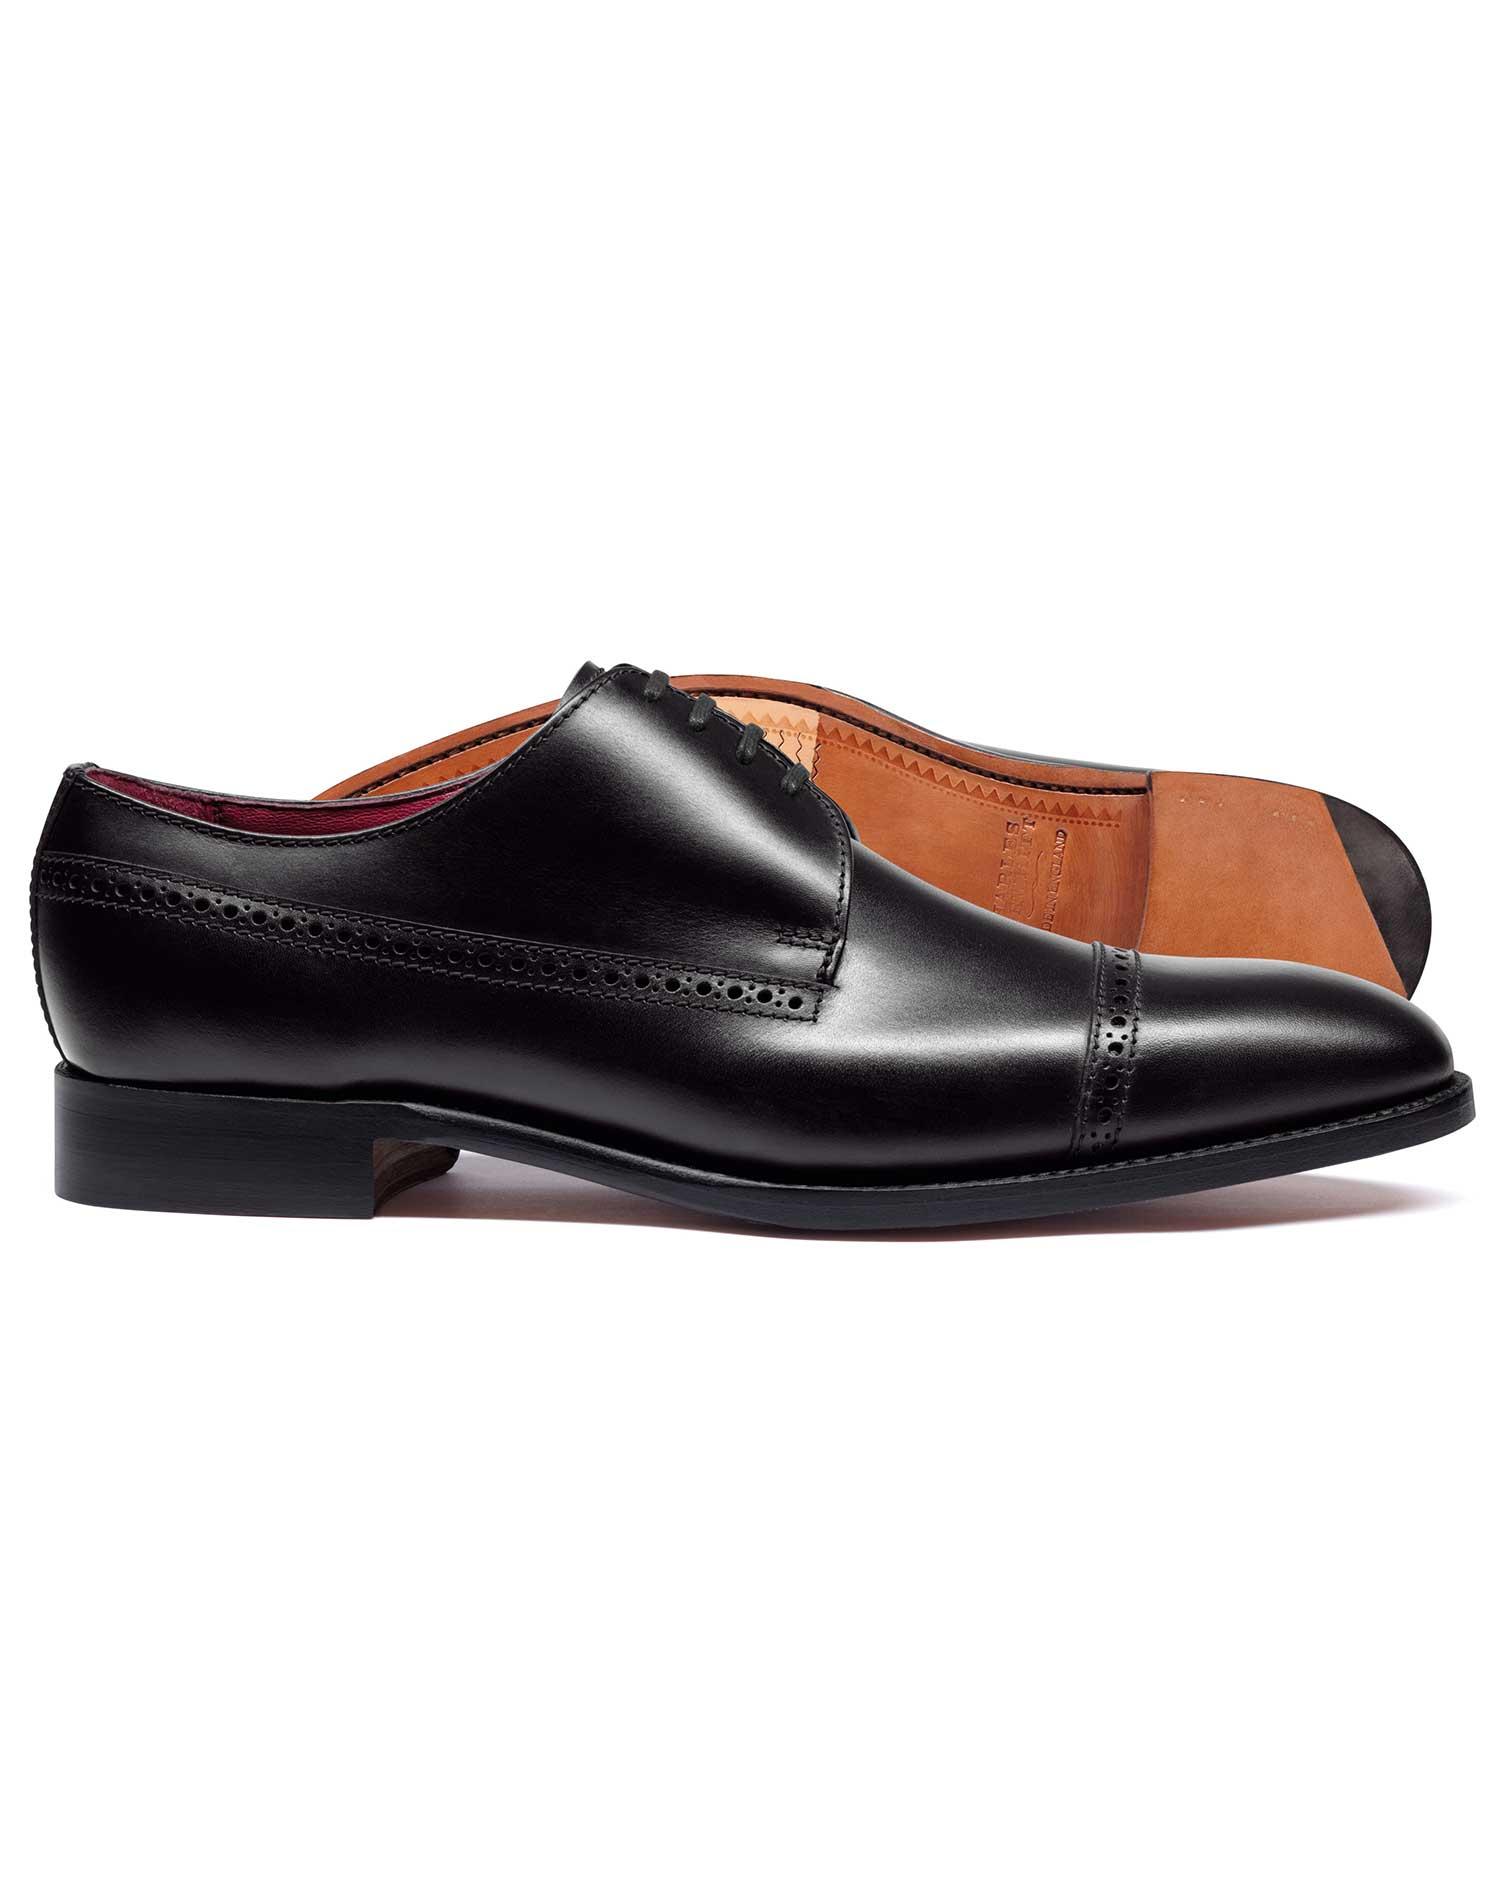 Black Made In England Derby Brogue Toe Cap Flex Sole Shoe Size 6.5 W by Charles Tyrwhitt